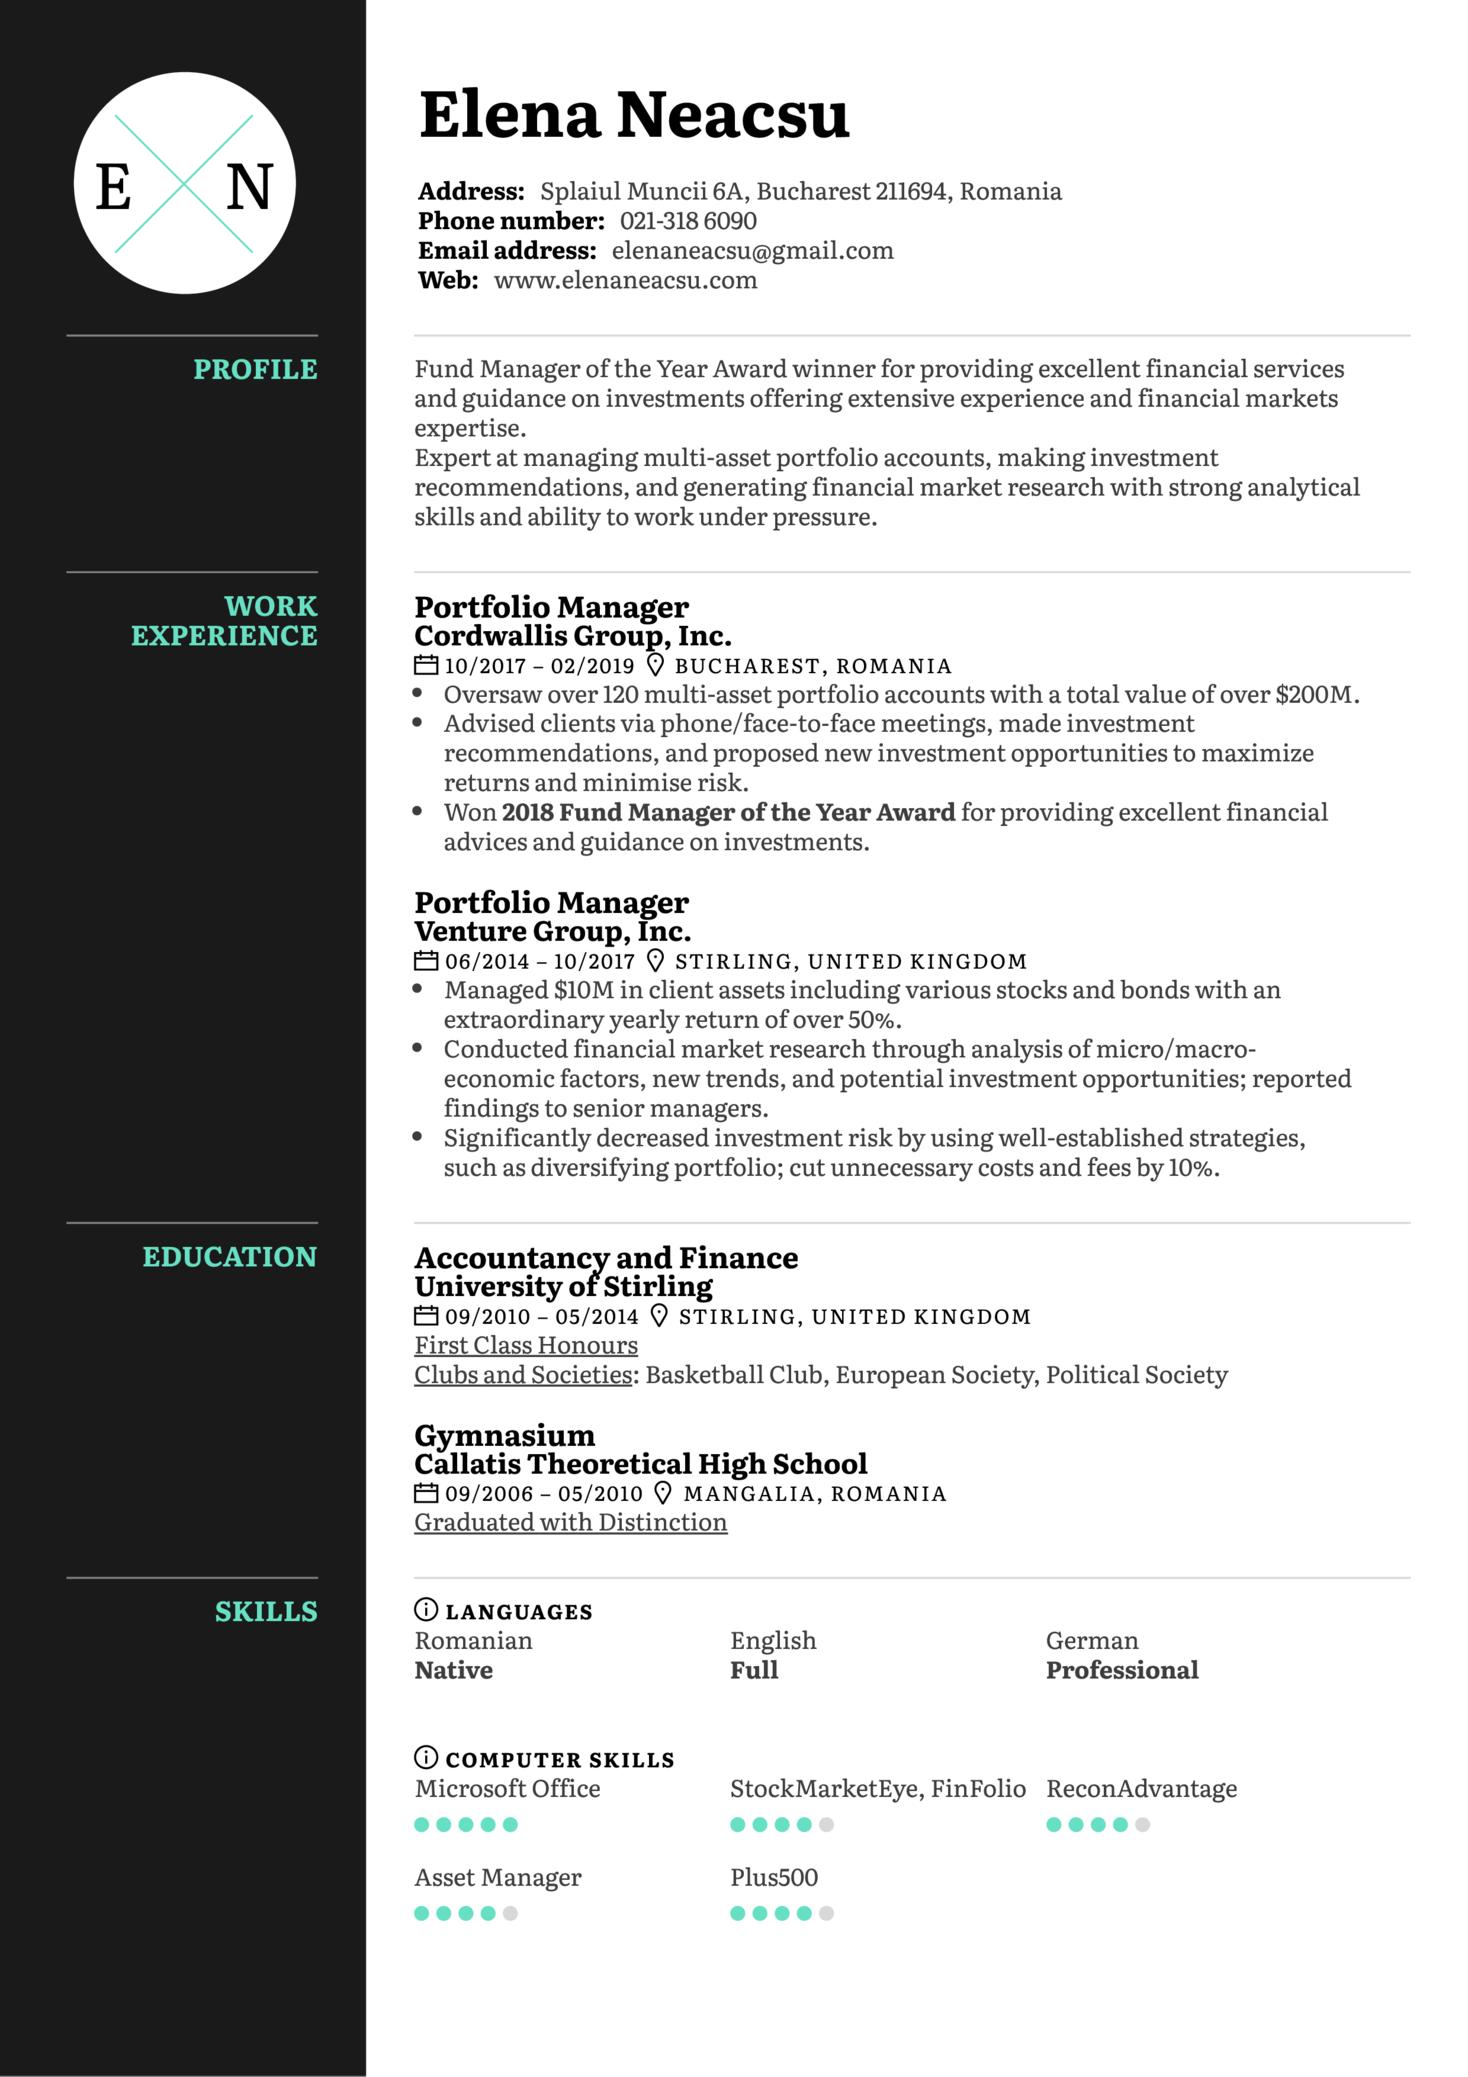 Portfolio Manager Resume Example (parte 1)